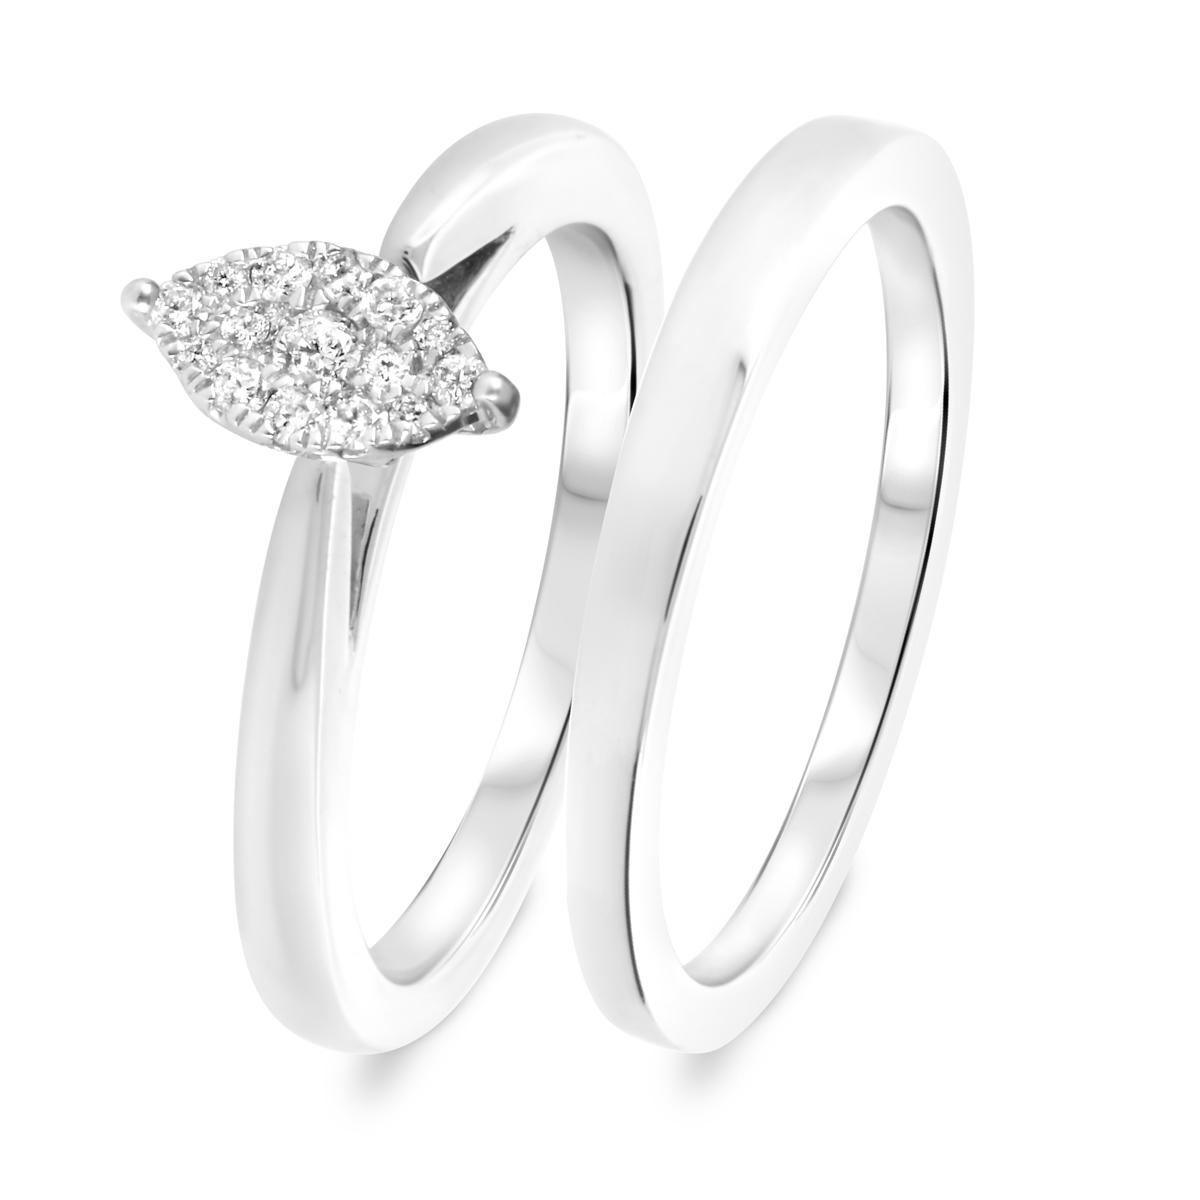 1/5 CT. T.W. Diamond Women's Bridal Wedding Ring Set 10K White Gold